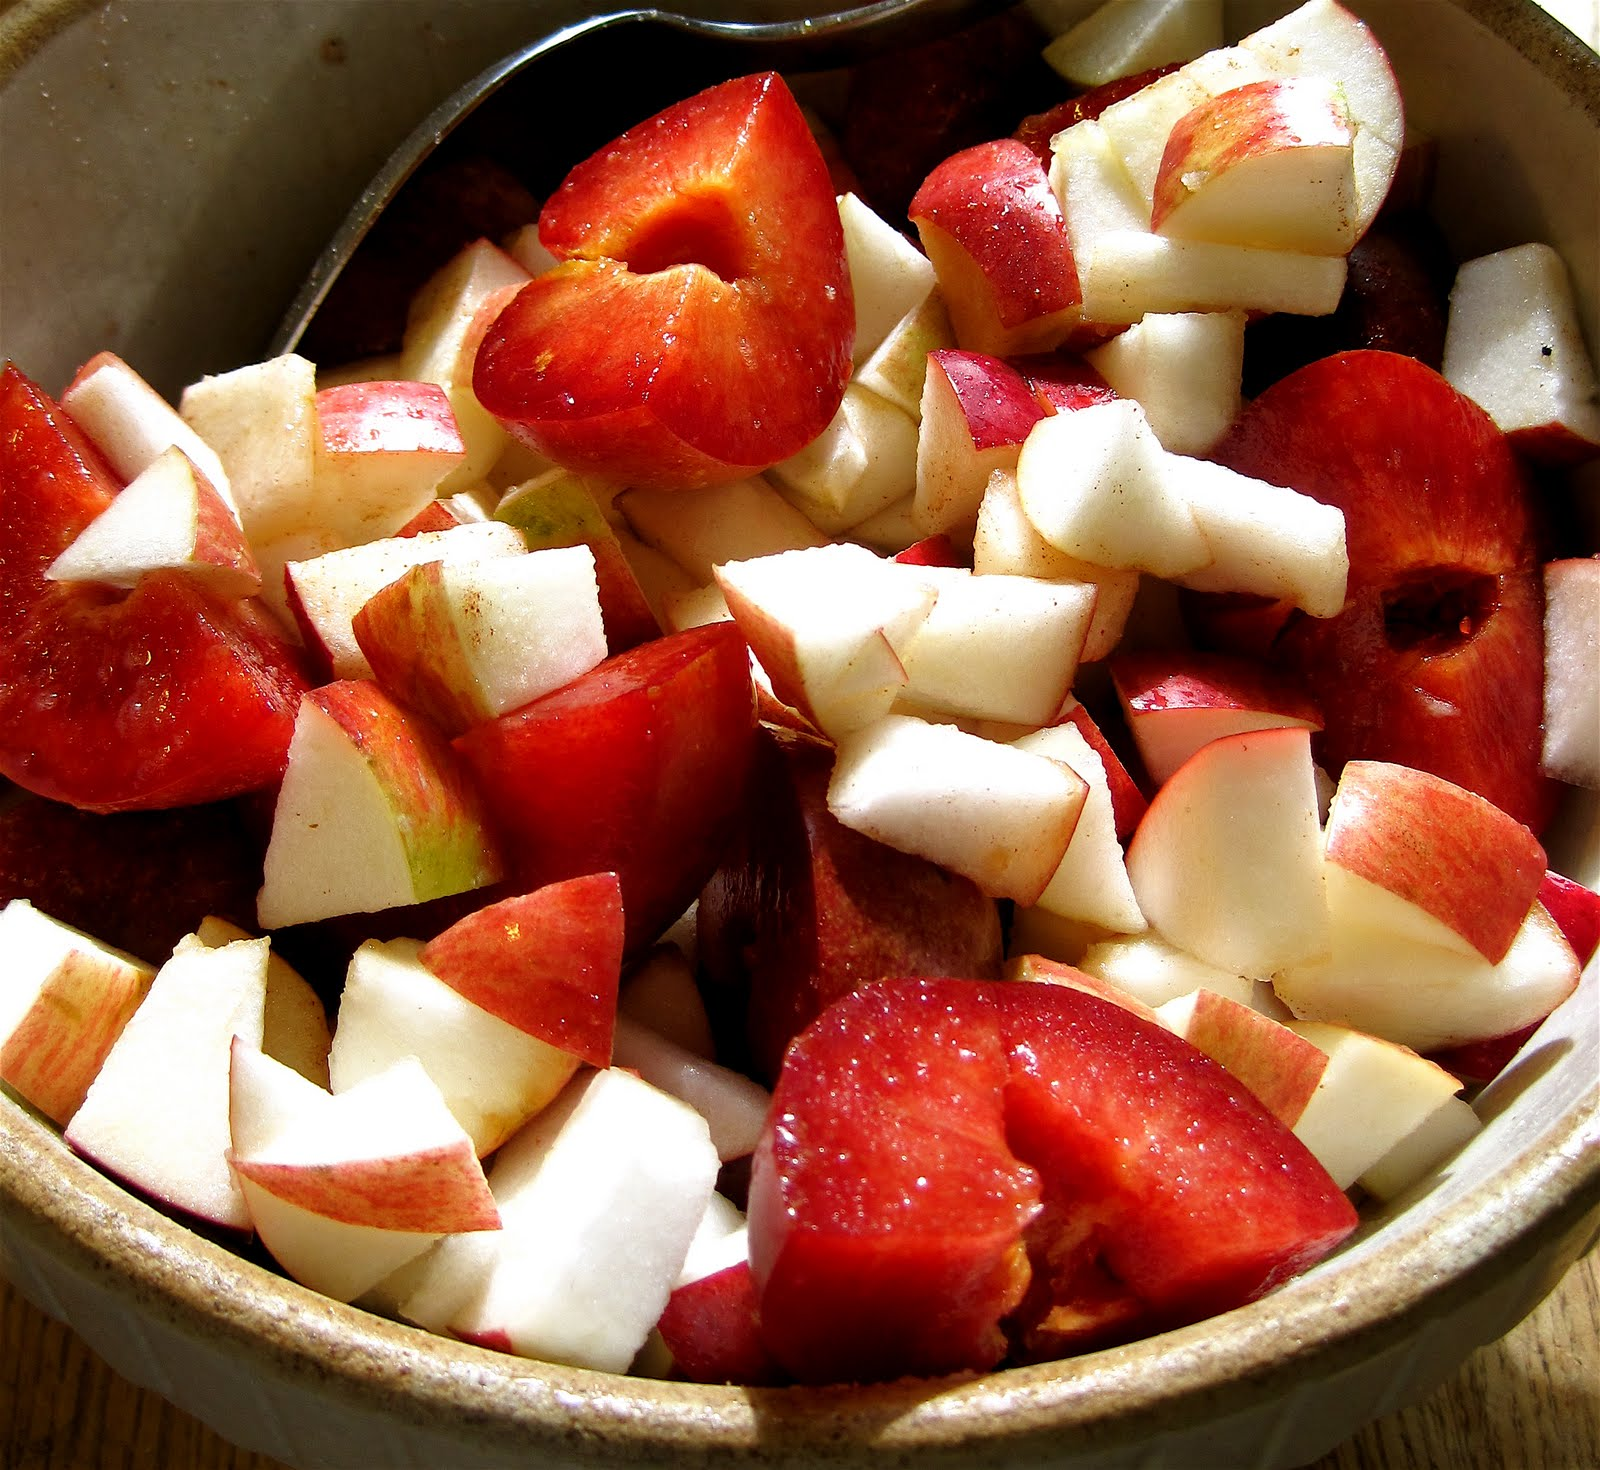 What's for Dinner Minneapolis?: Plum-Apple Top Crust Pie